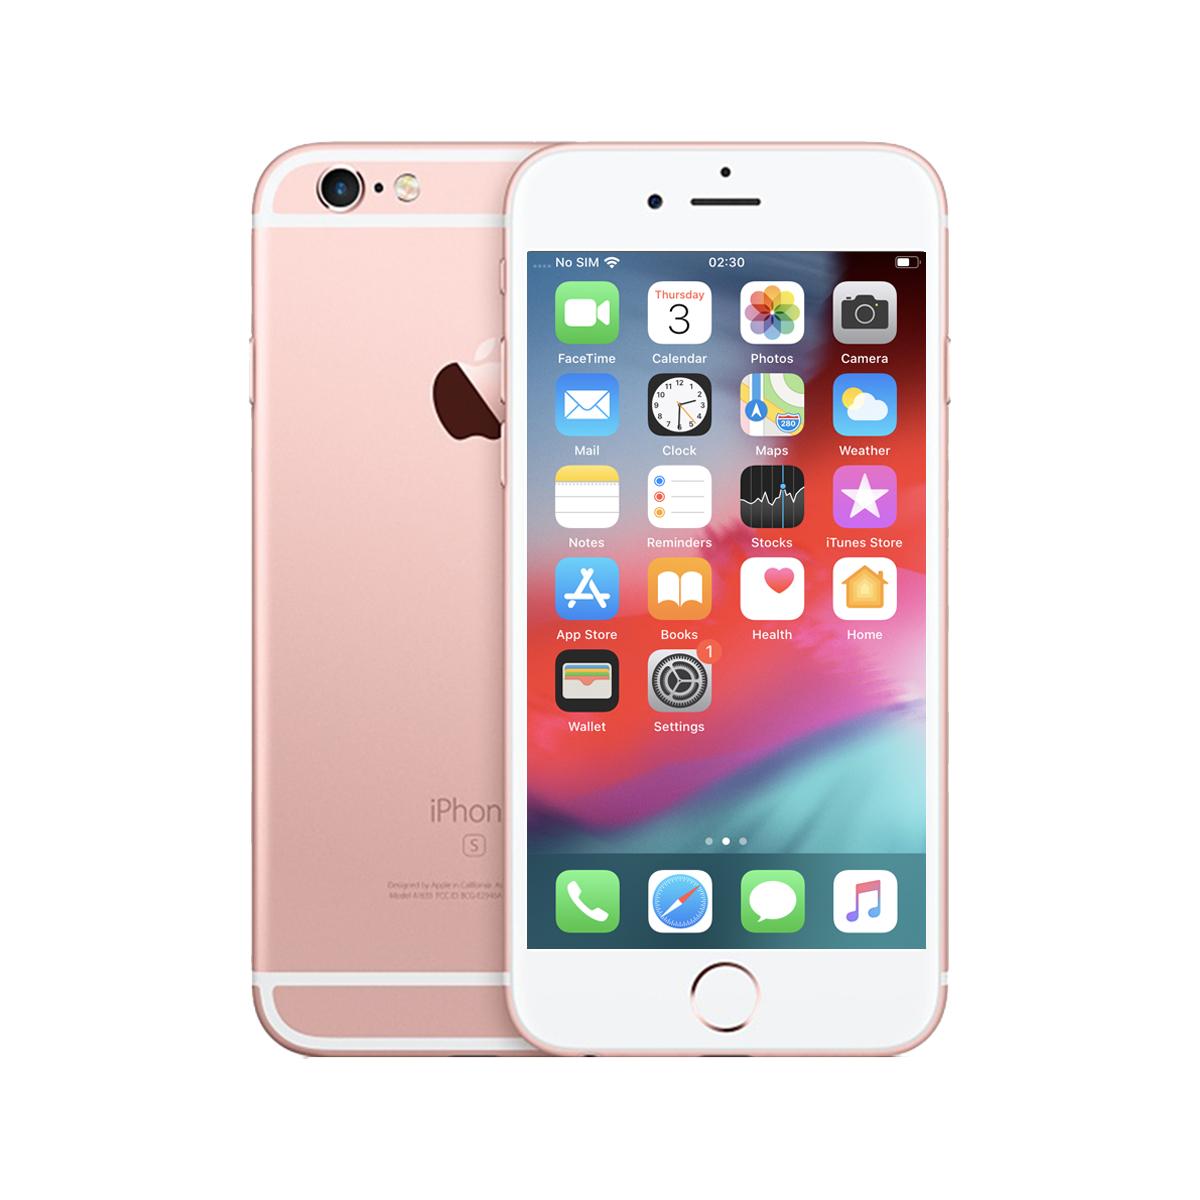 A-Grade iPhone 6S Rosegold 16GB